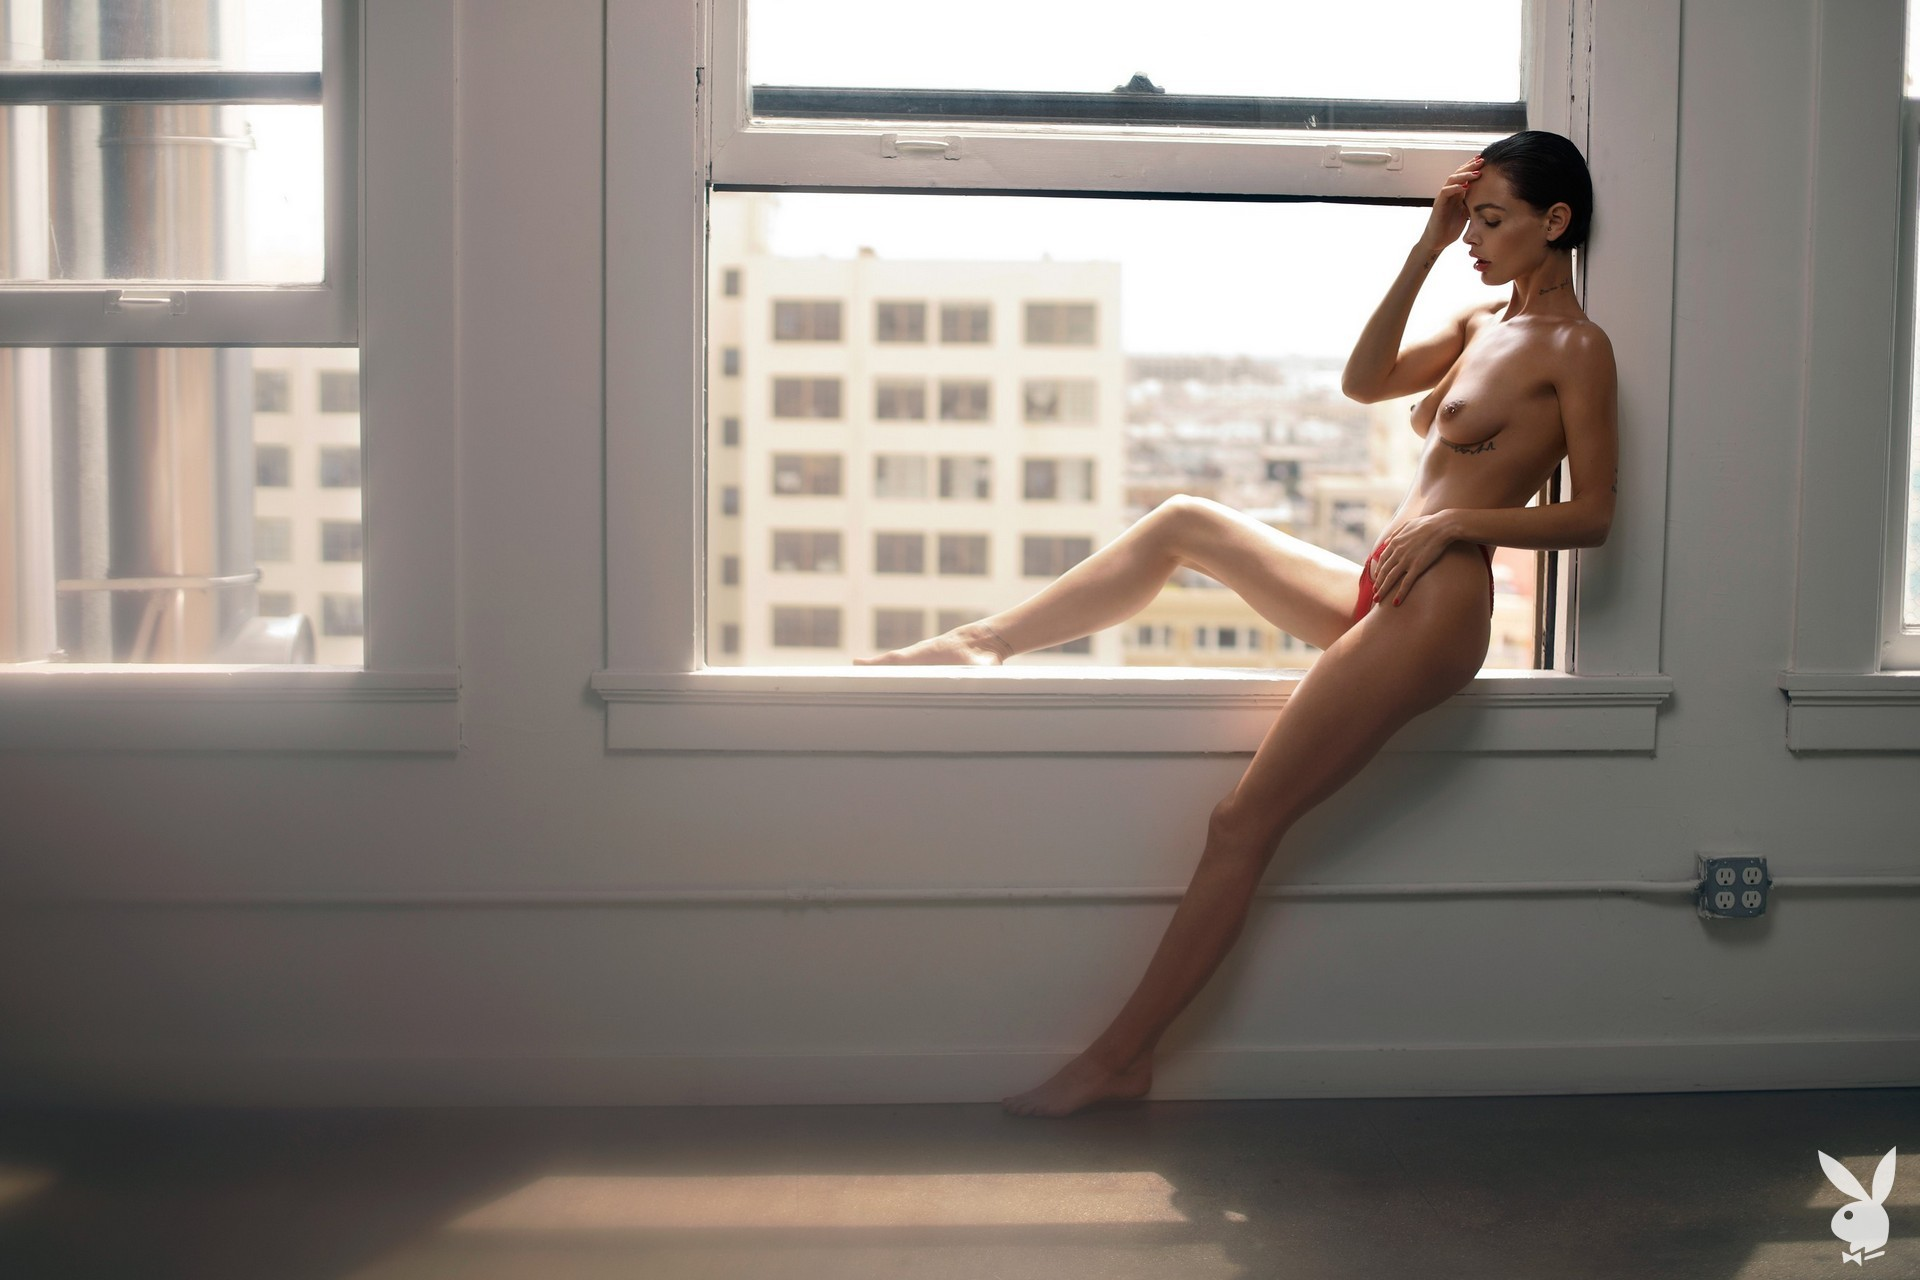 Playmate July 2019 Teela Laroux Playboy Plus (31)